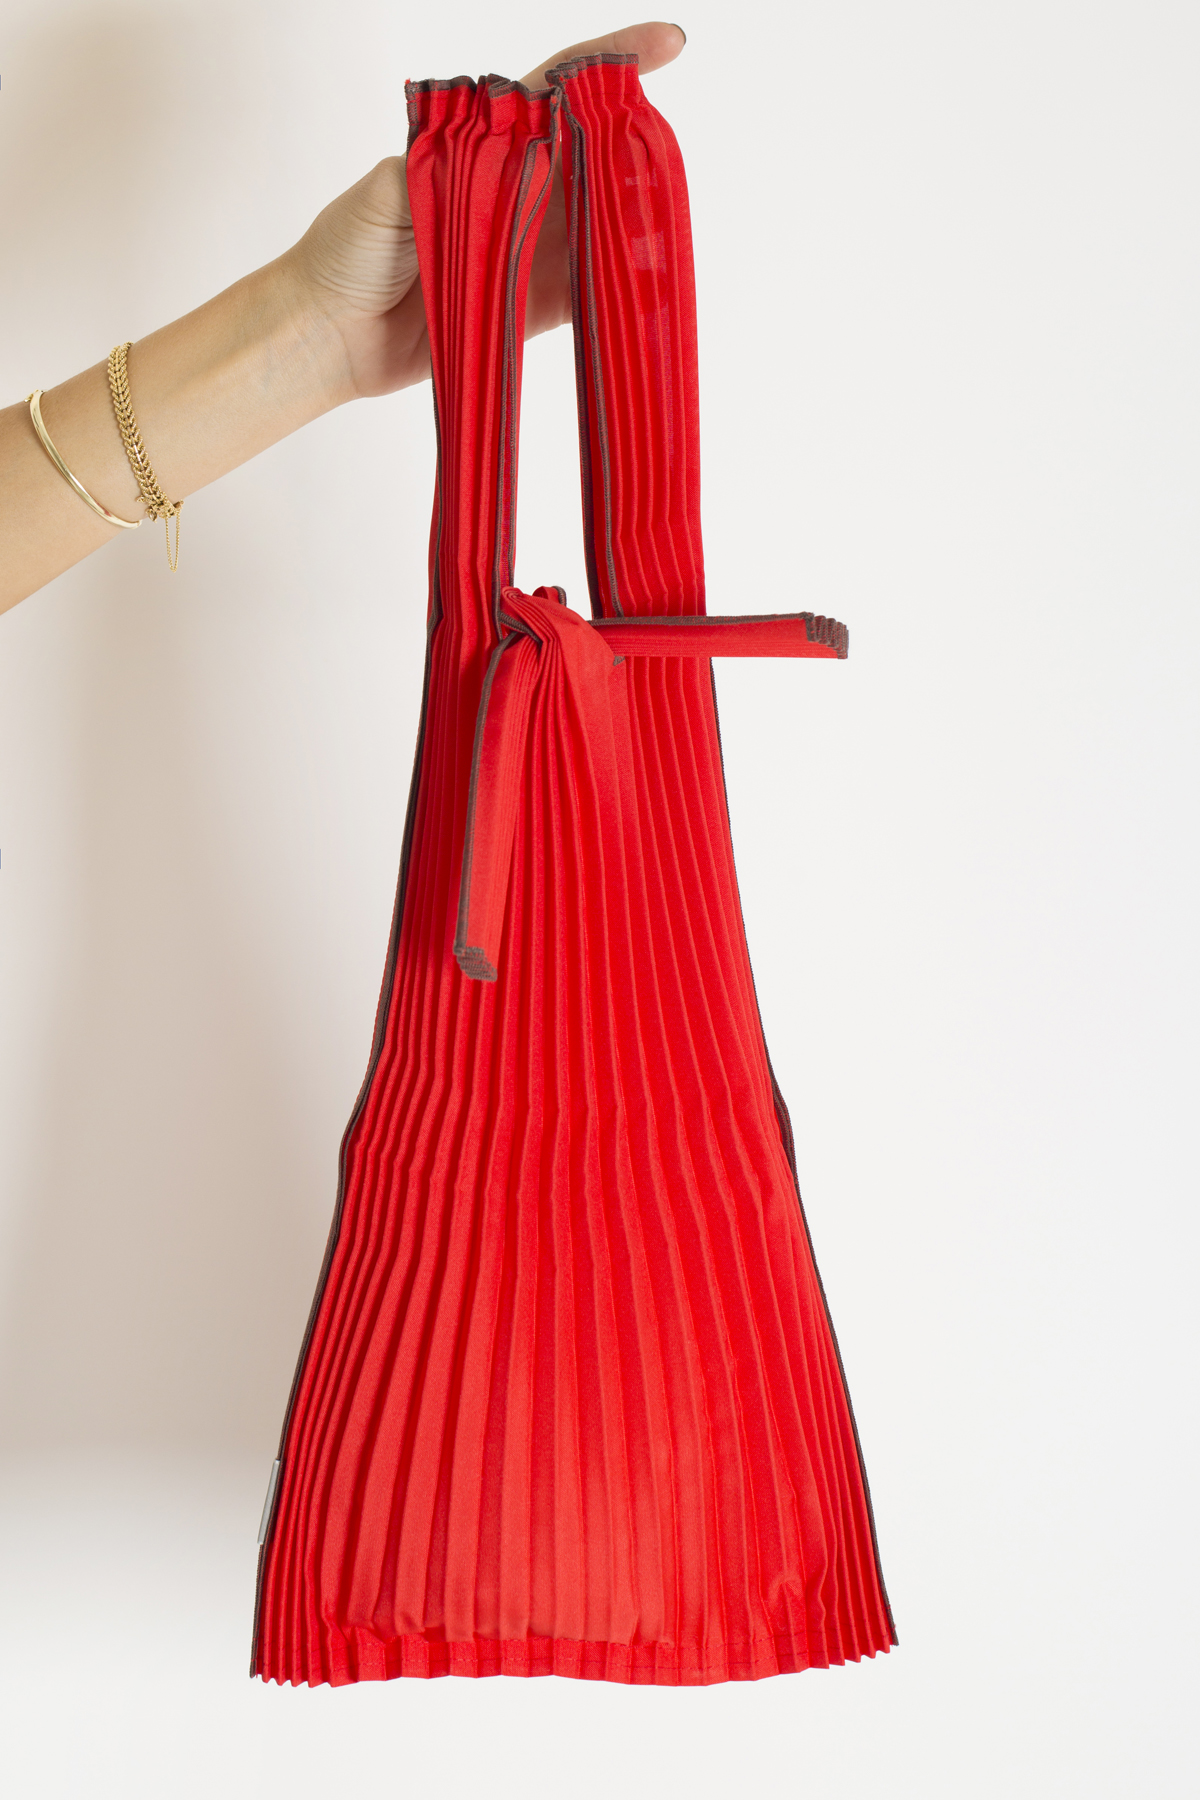 tote-small-red-pleats-pleco-matchboxathens